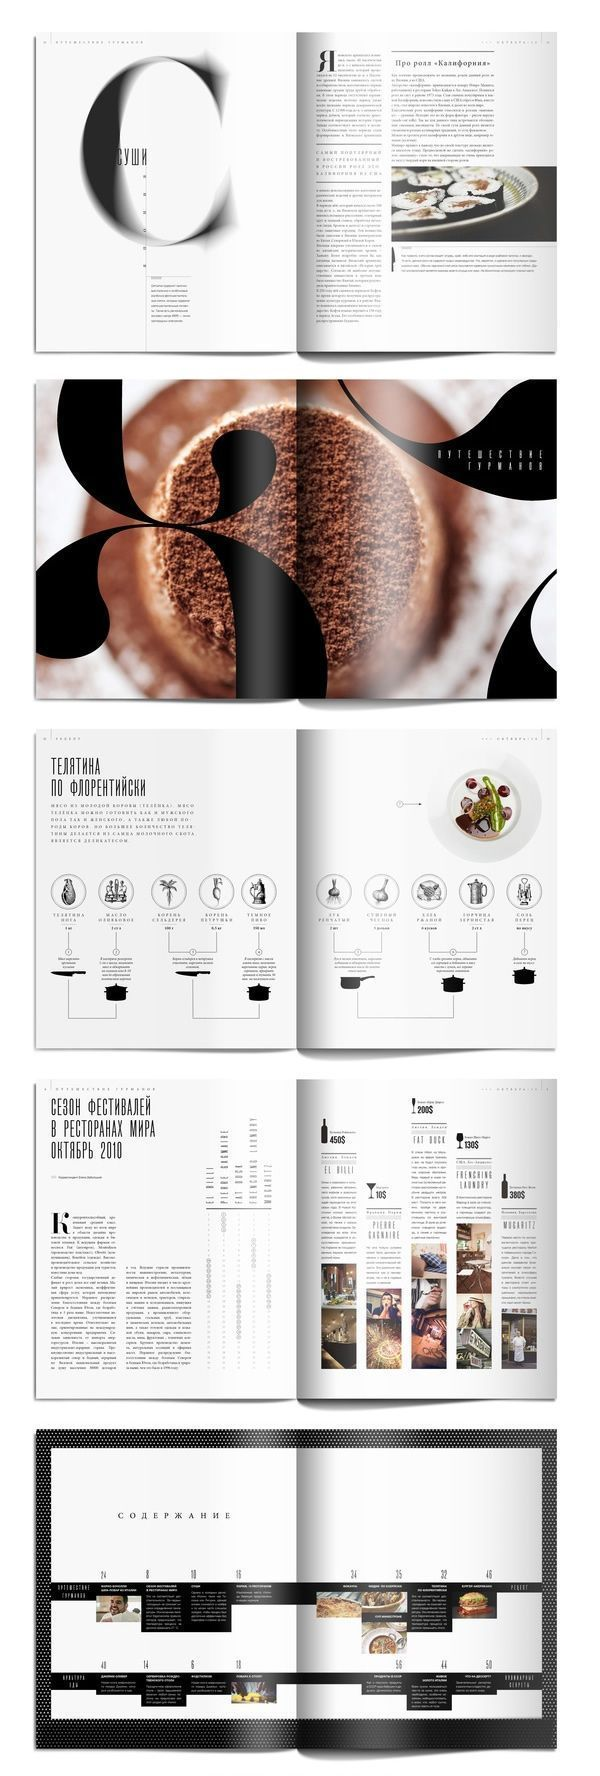 Editorial Design / Food Magazine Editorial Design — Designspiration #SEOScheme